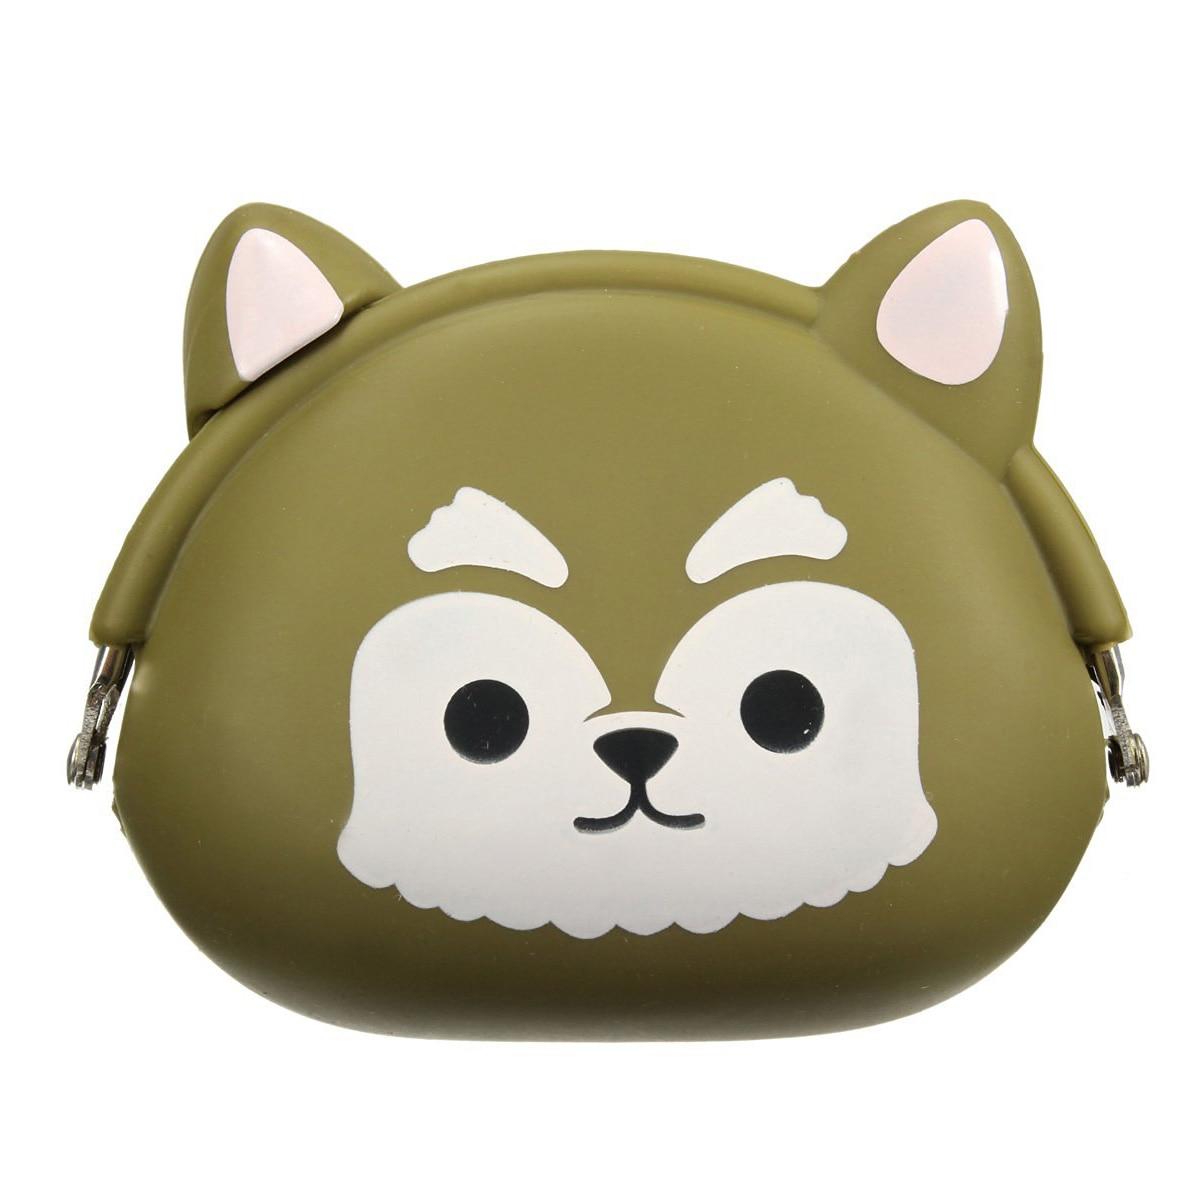 SCYL Women Girls Wallet Kawaii Cute Cartoon Animal Silicone Jelly Coin Bag Purse Kids Gift Green dogs<br><br>Aliexpress